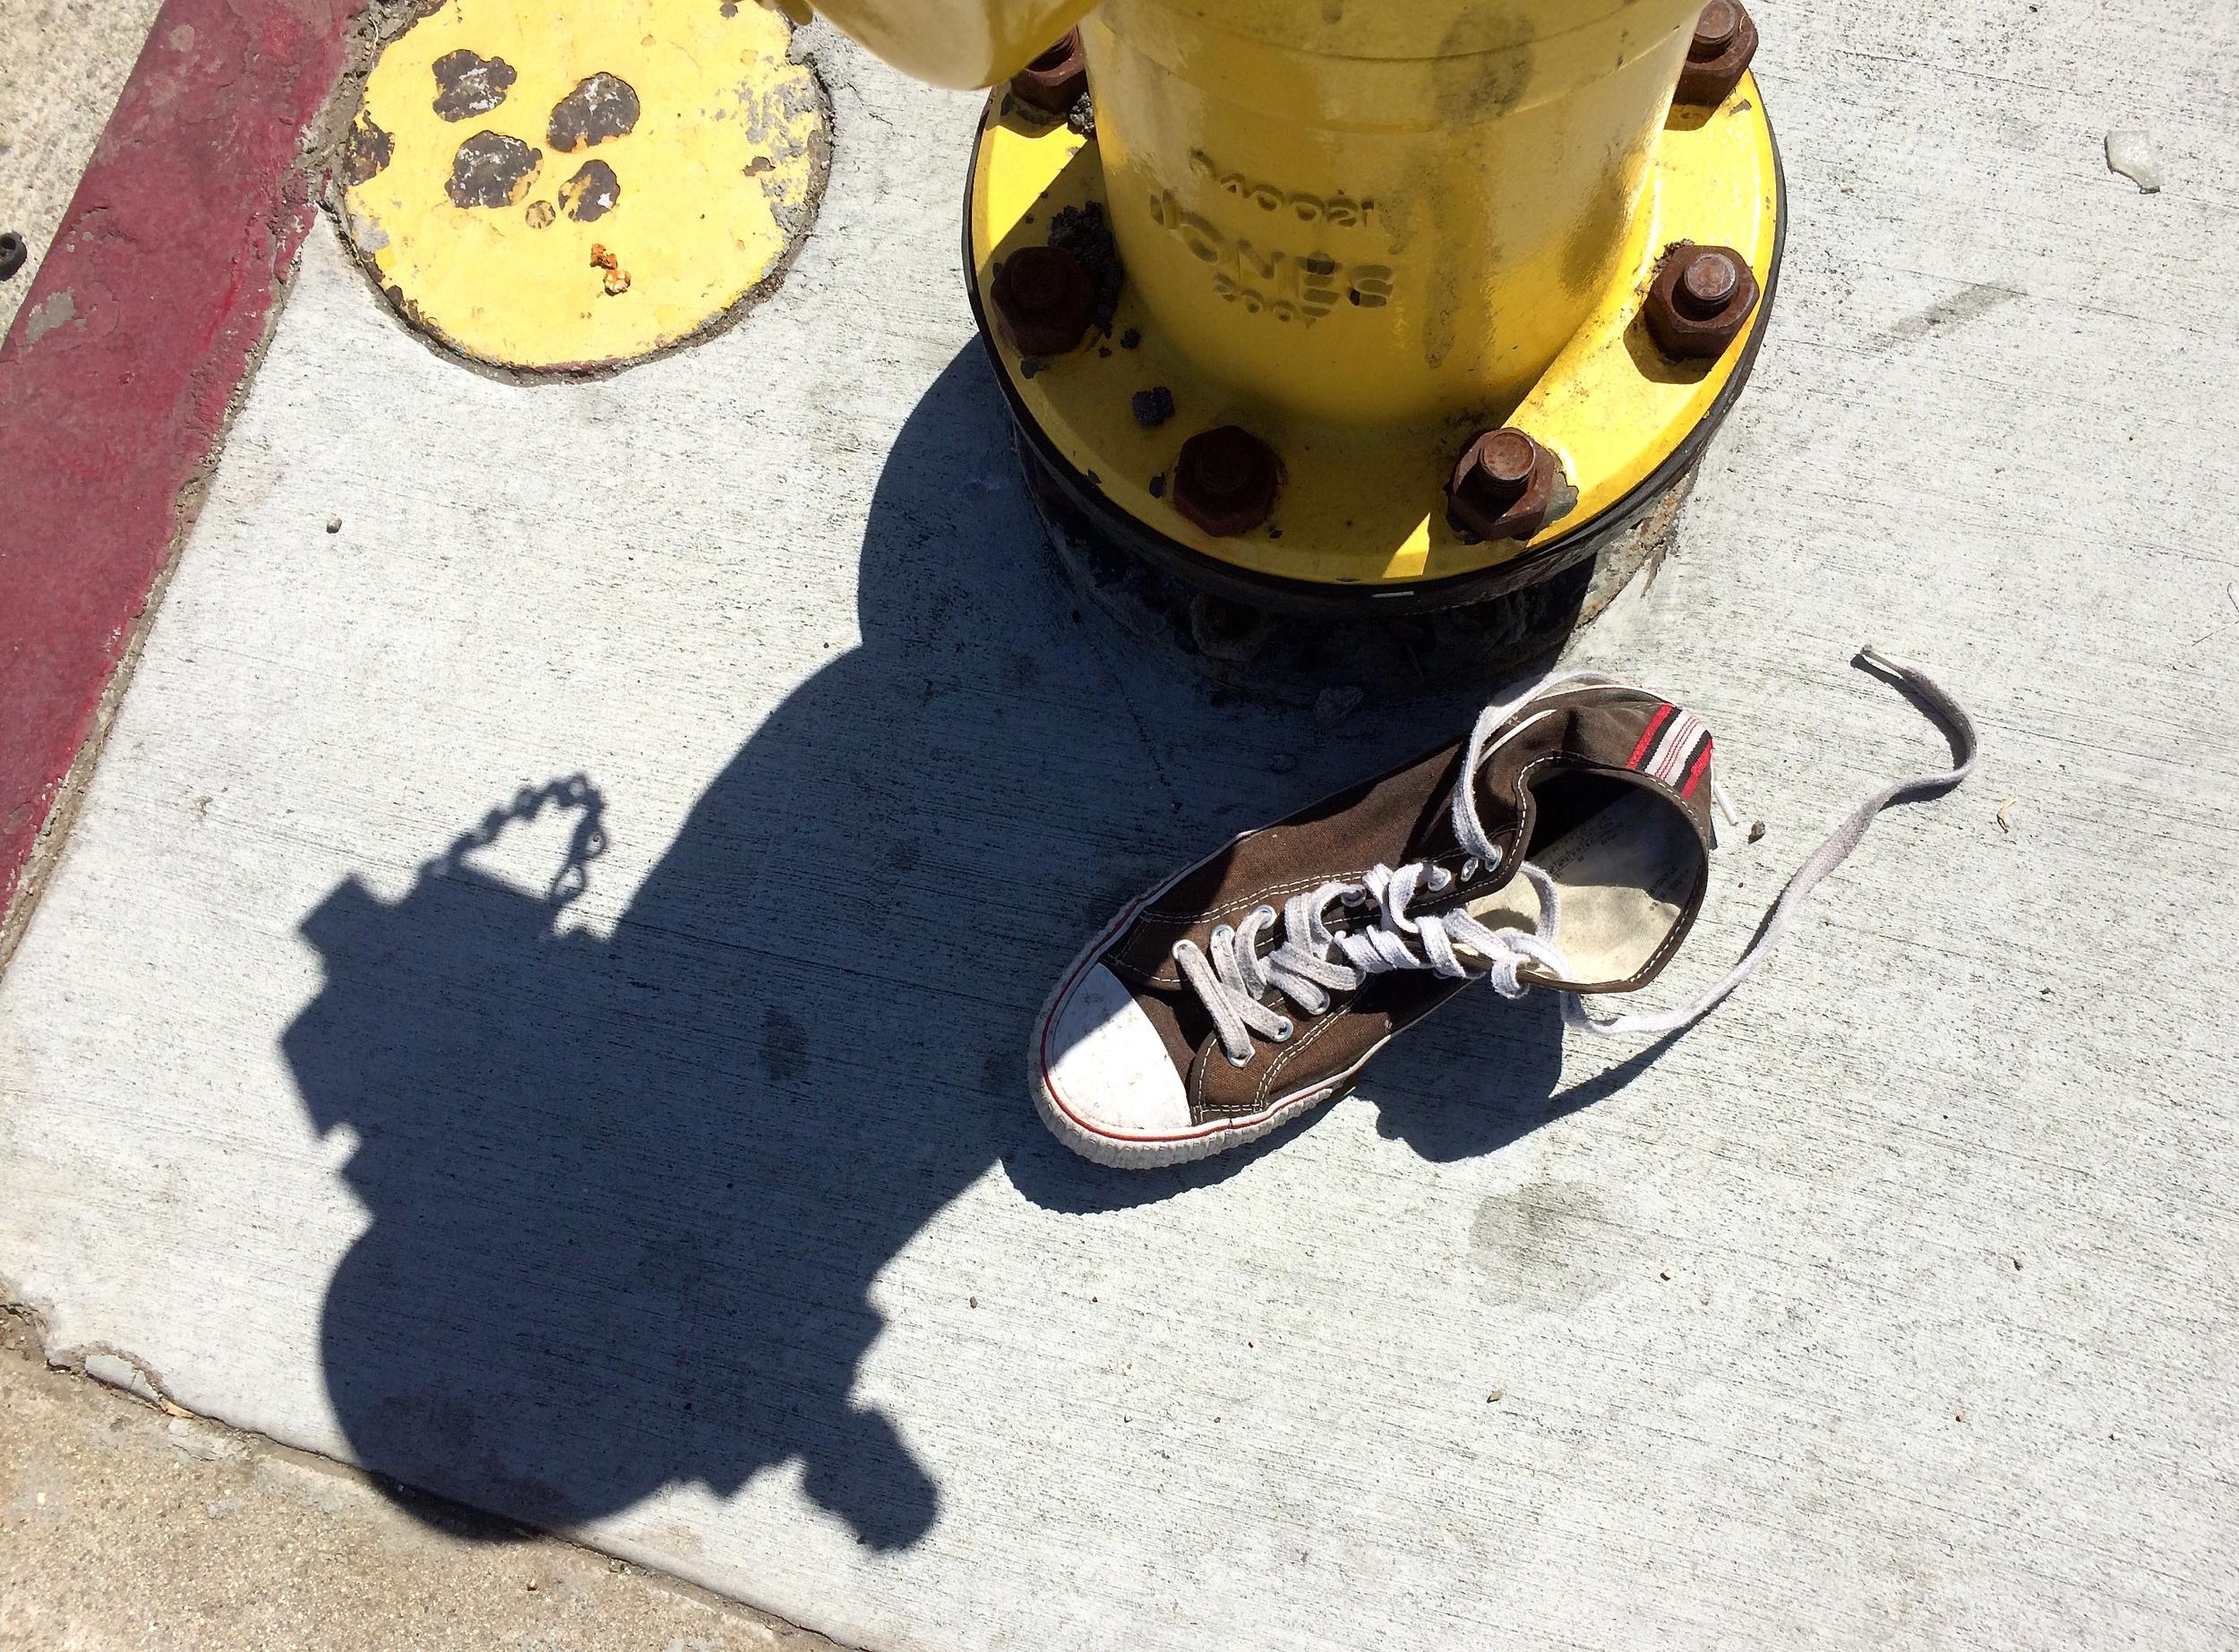 Sneaker and fireplug - 1.jpg